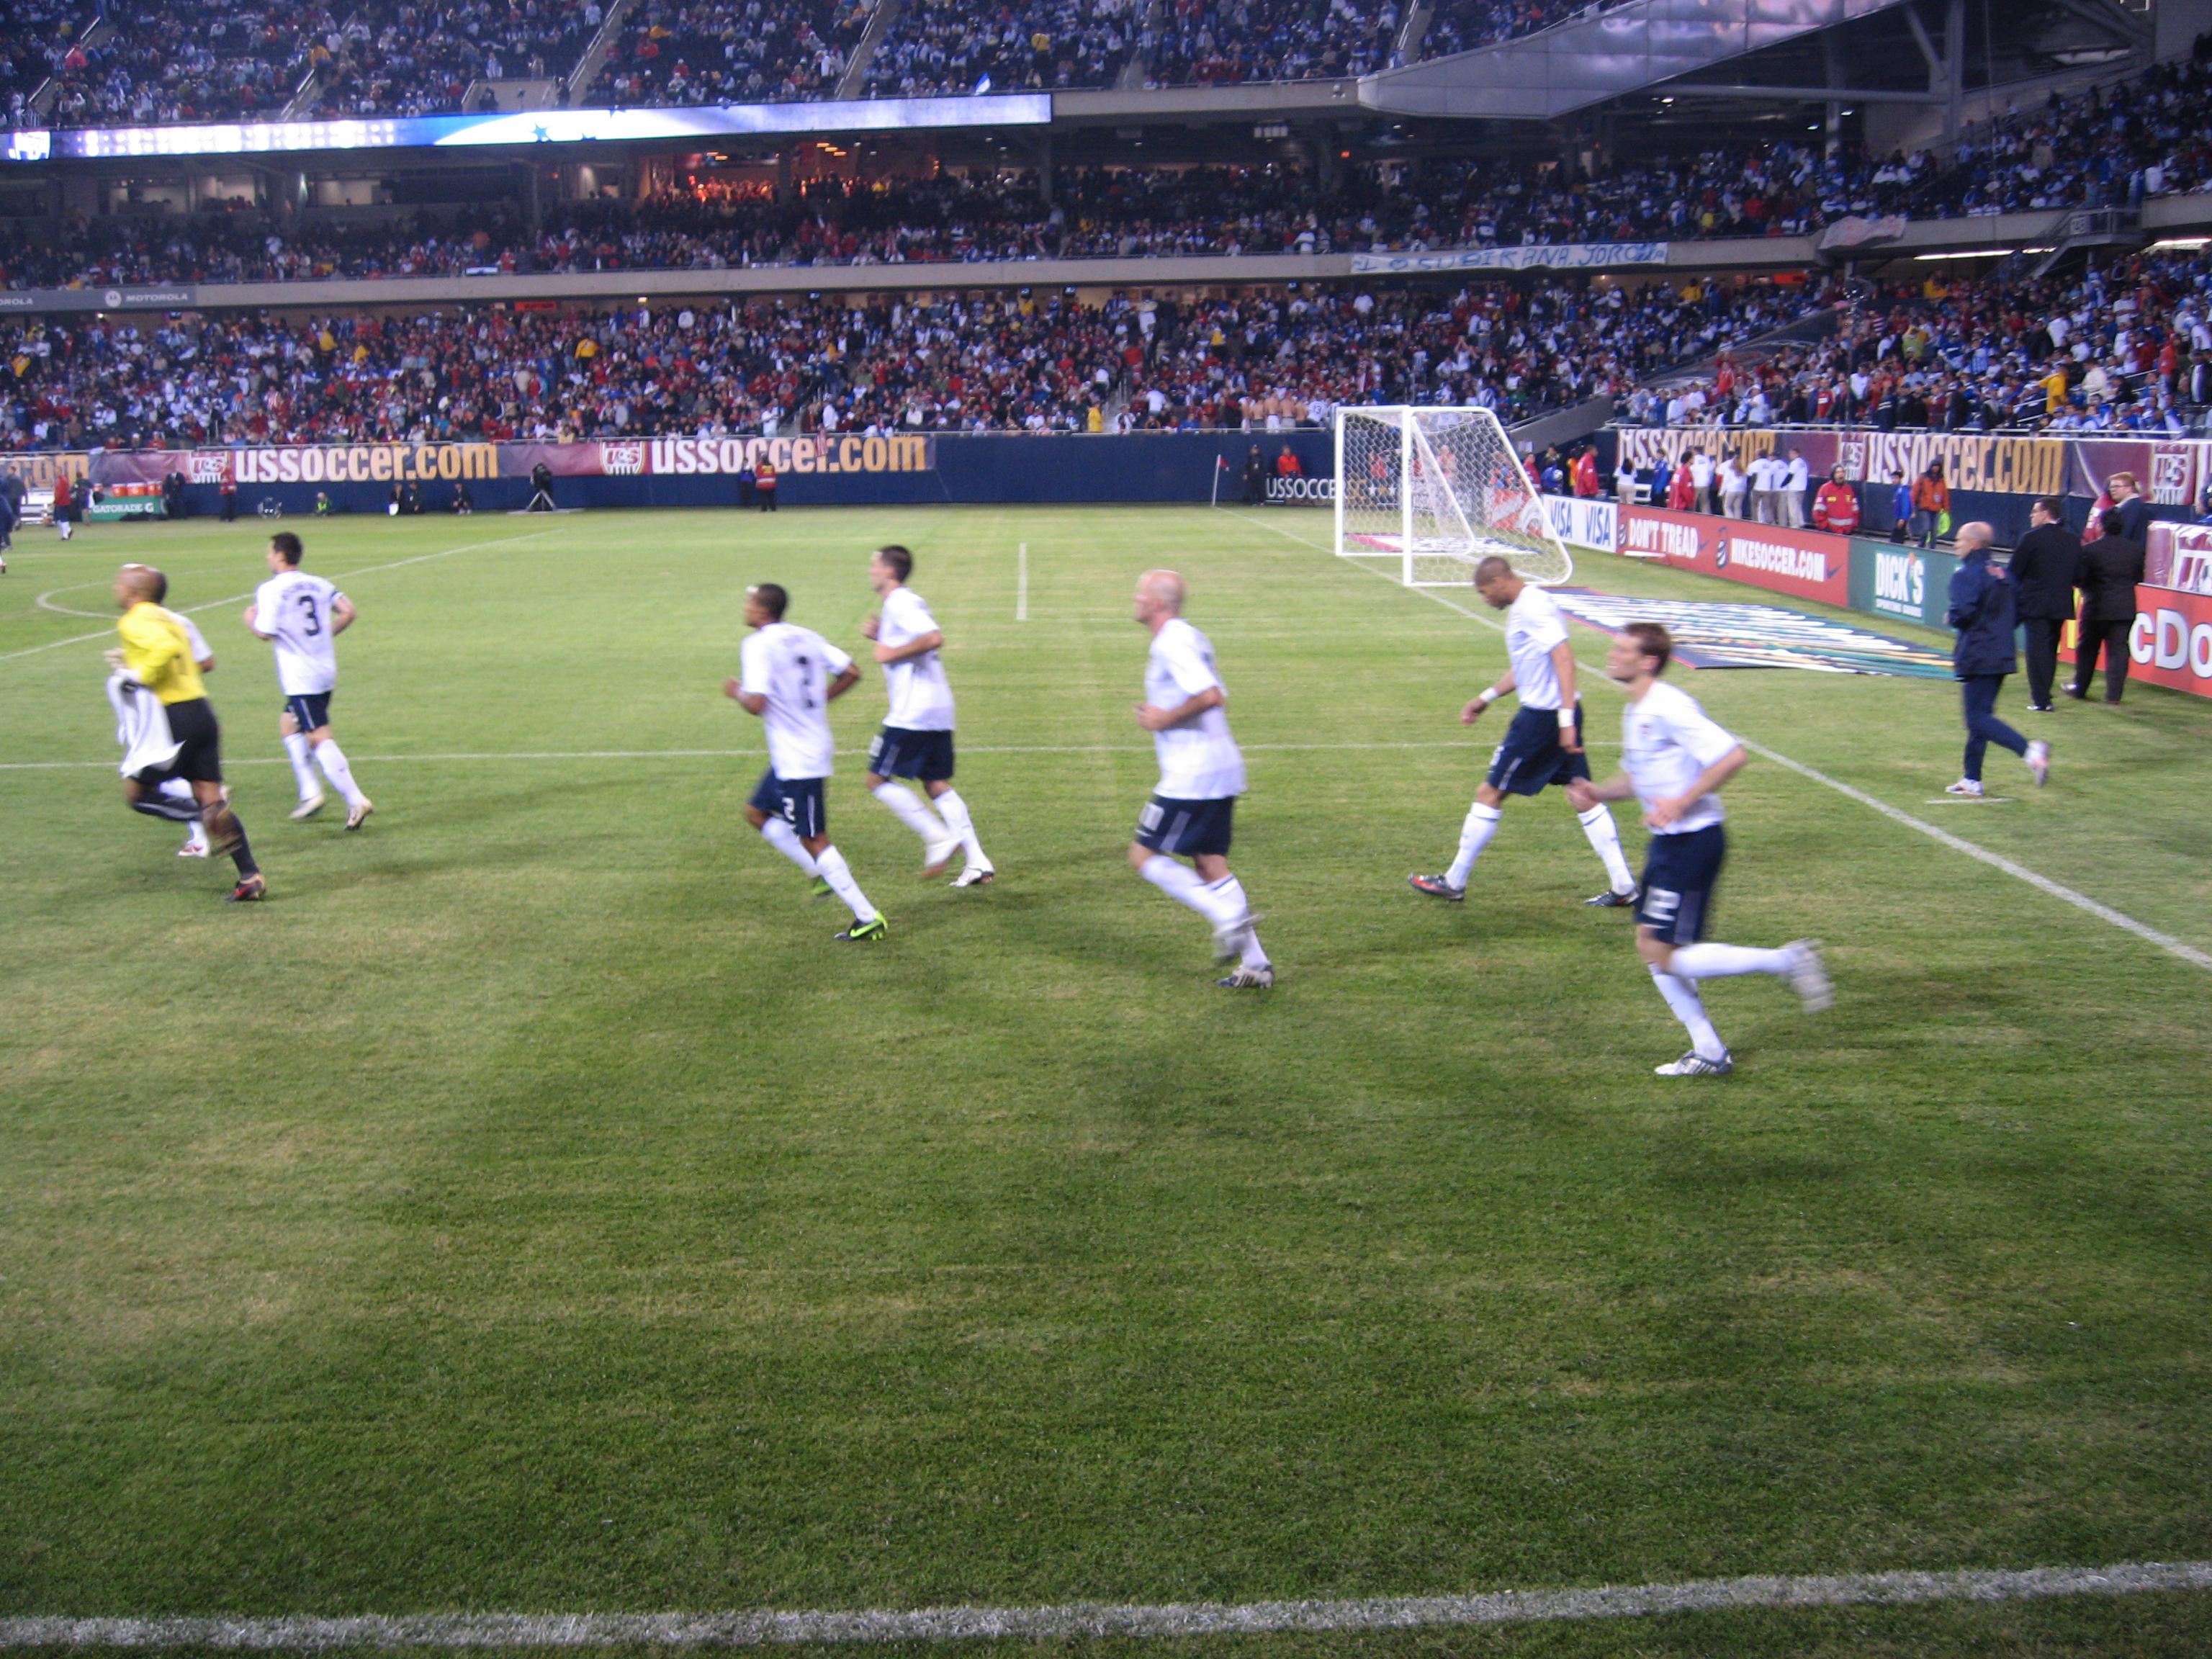 usa-soccer-trip-june-2009-022